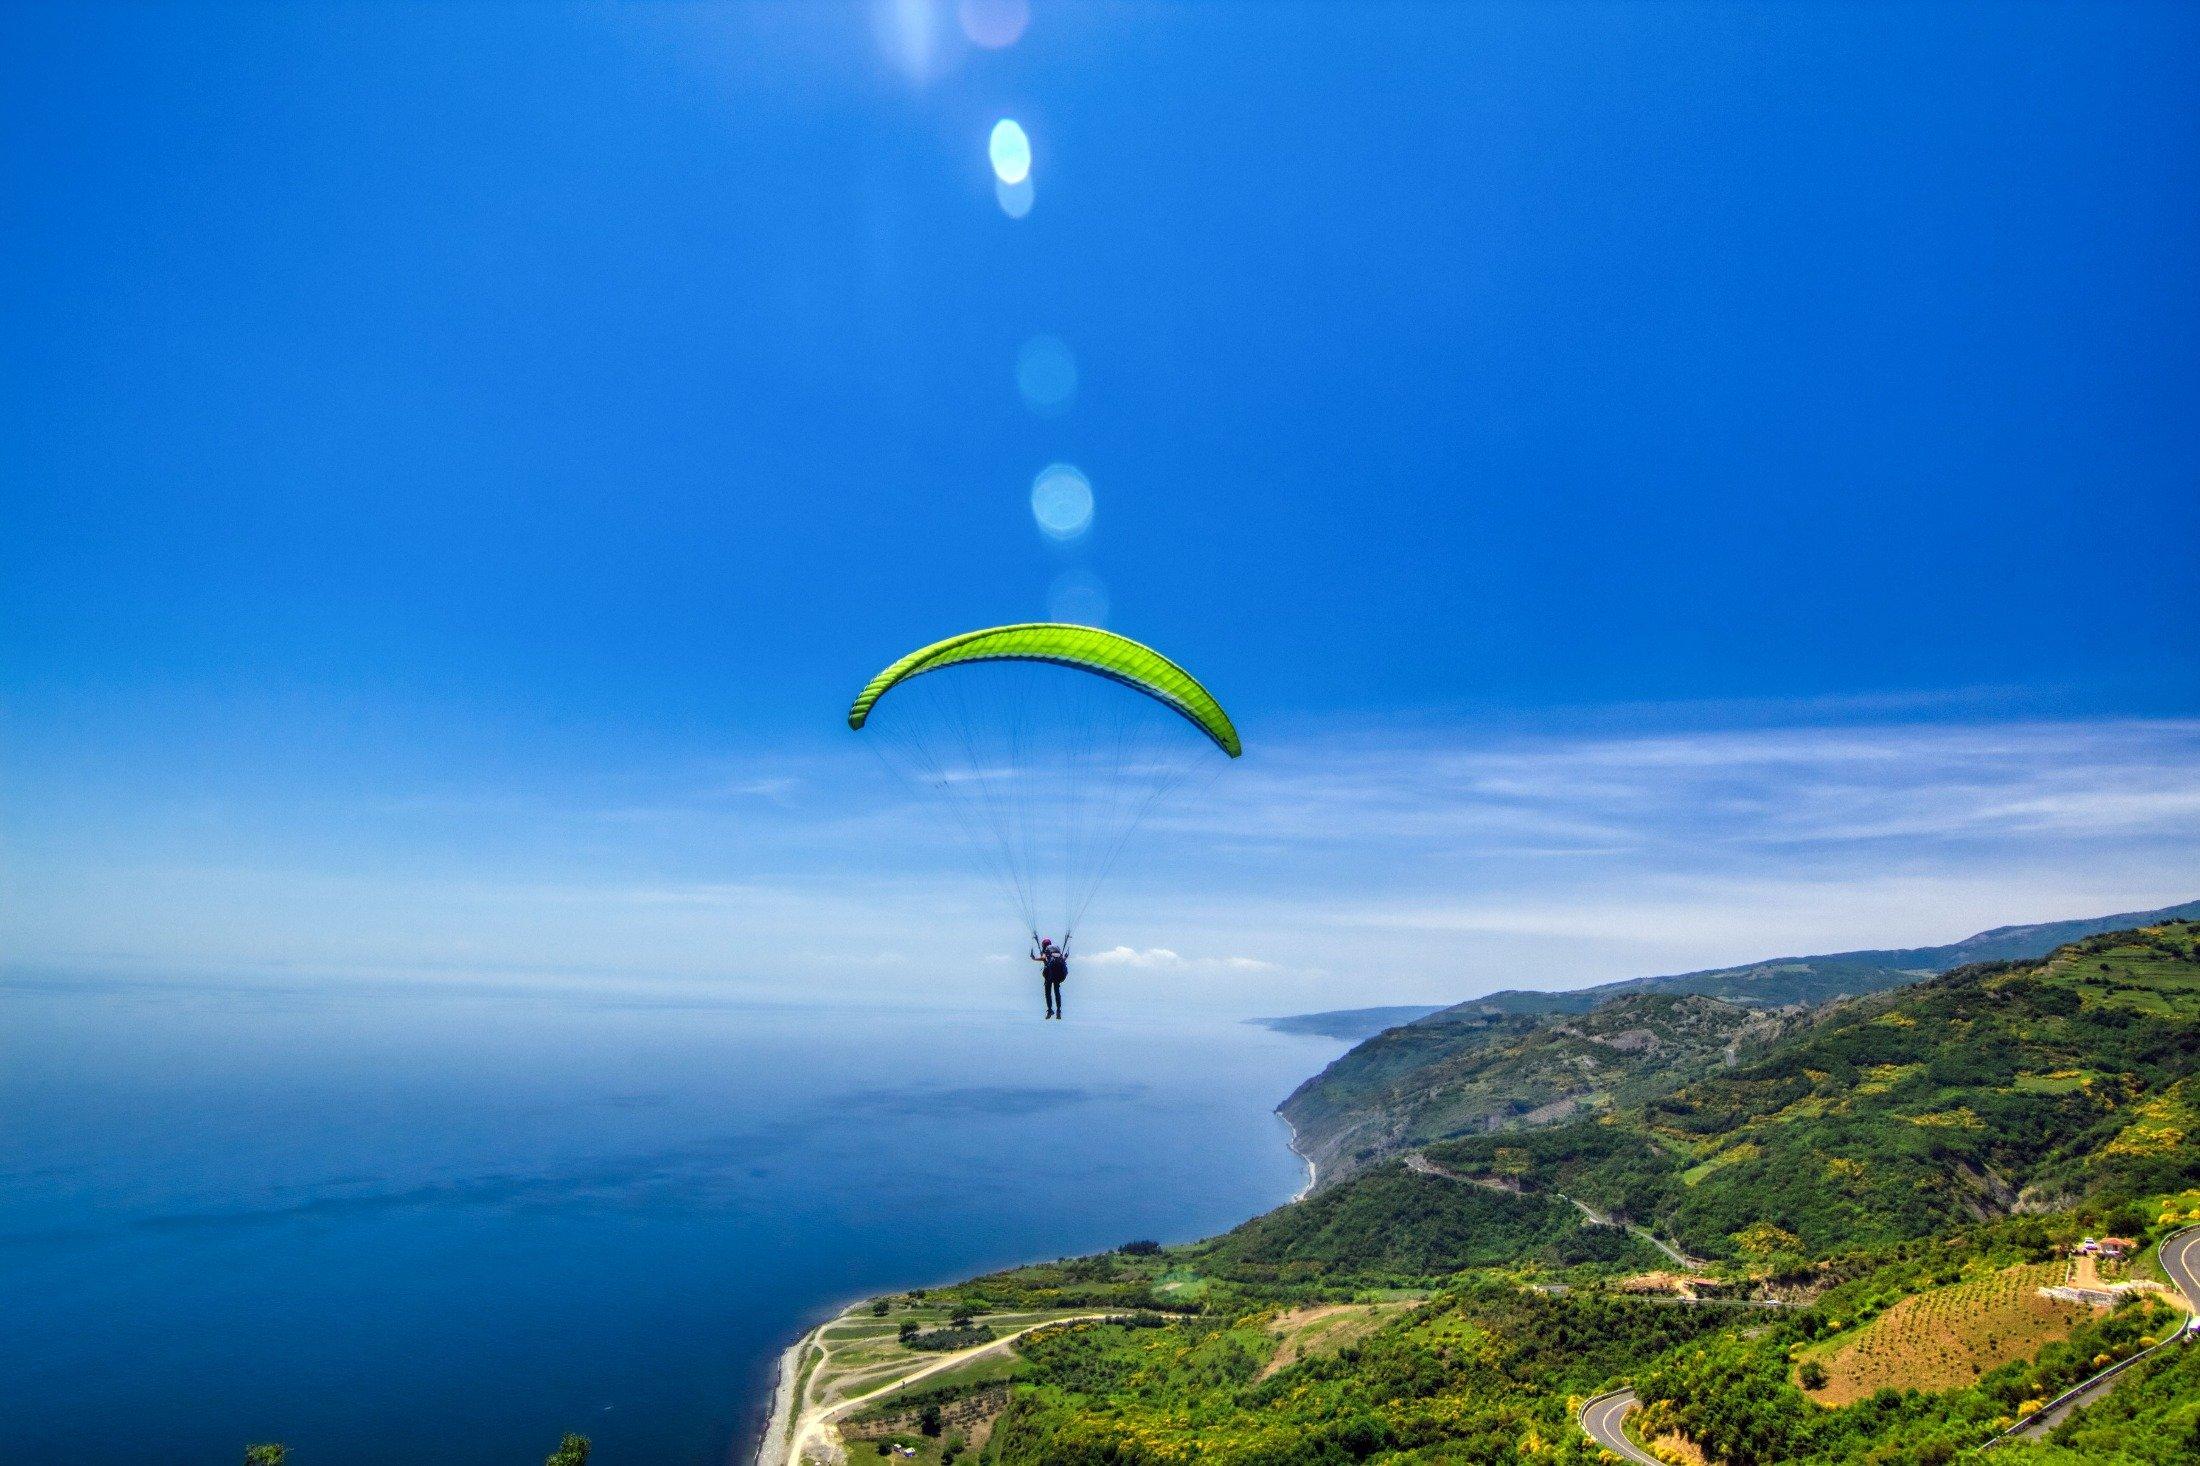 A man paraglides from Mount Ganos